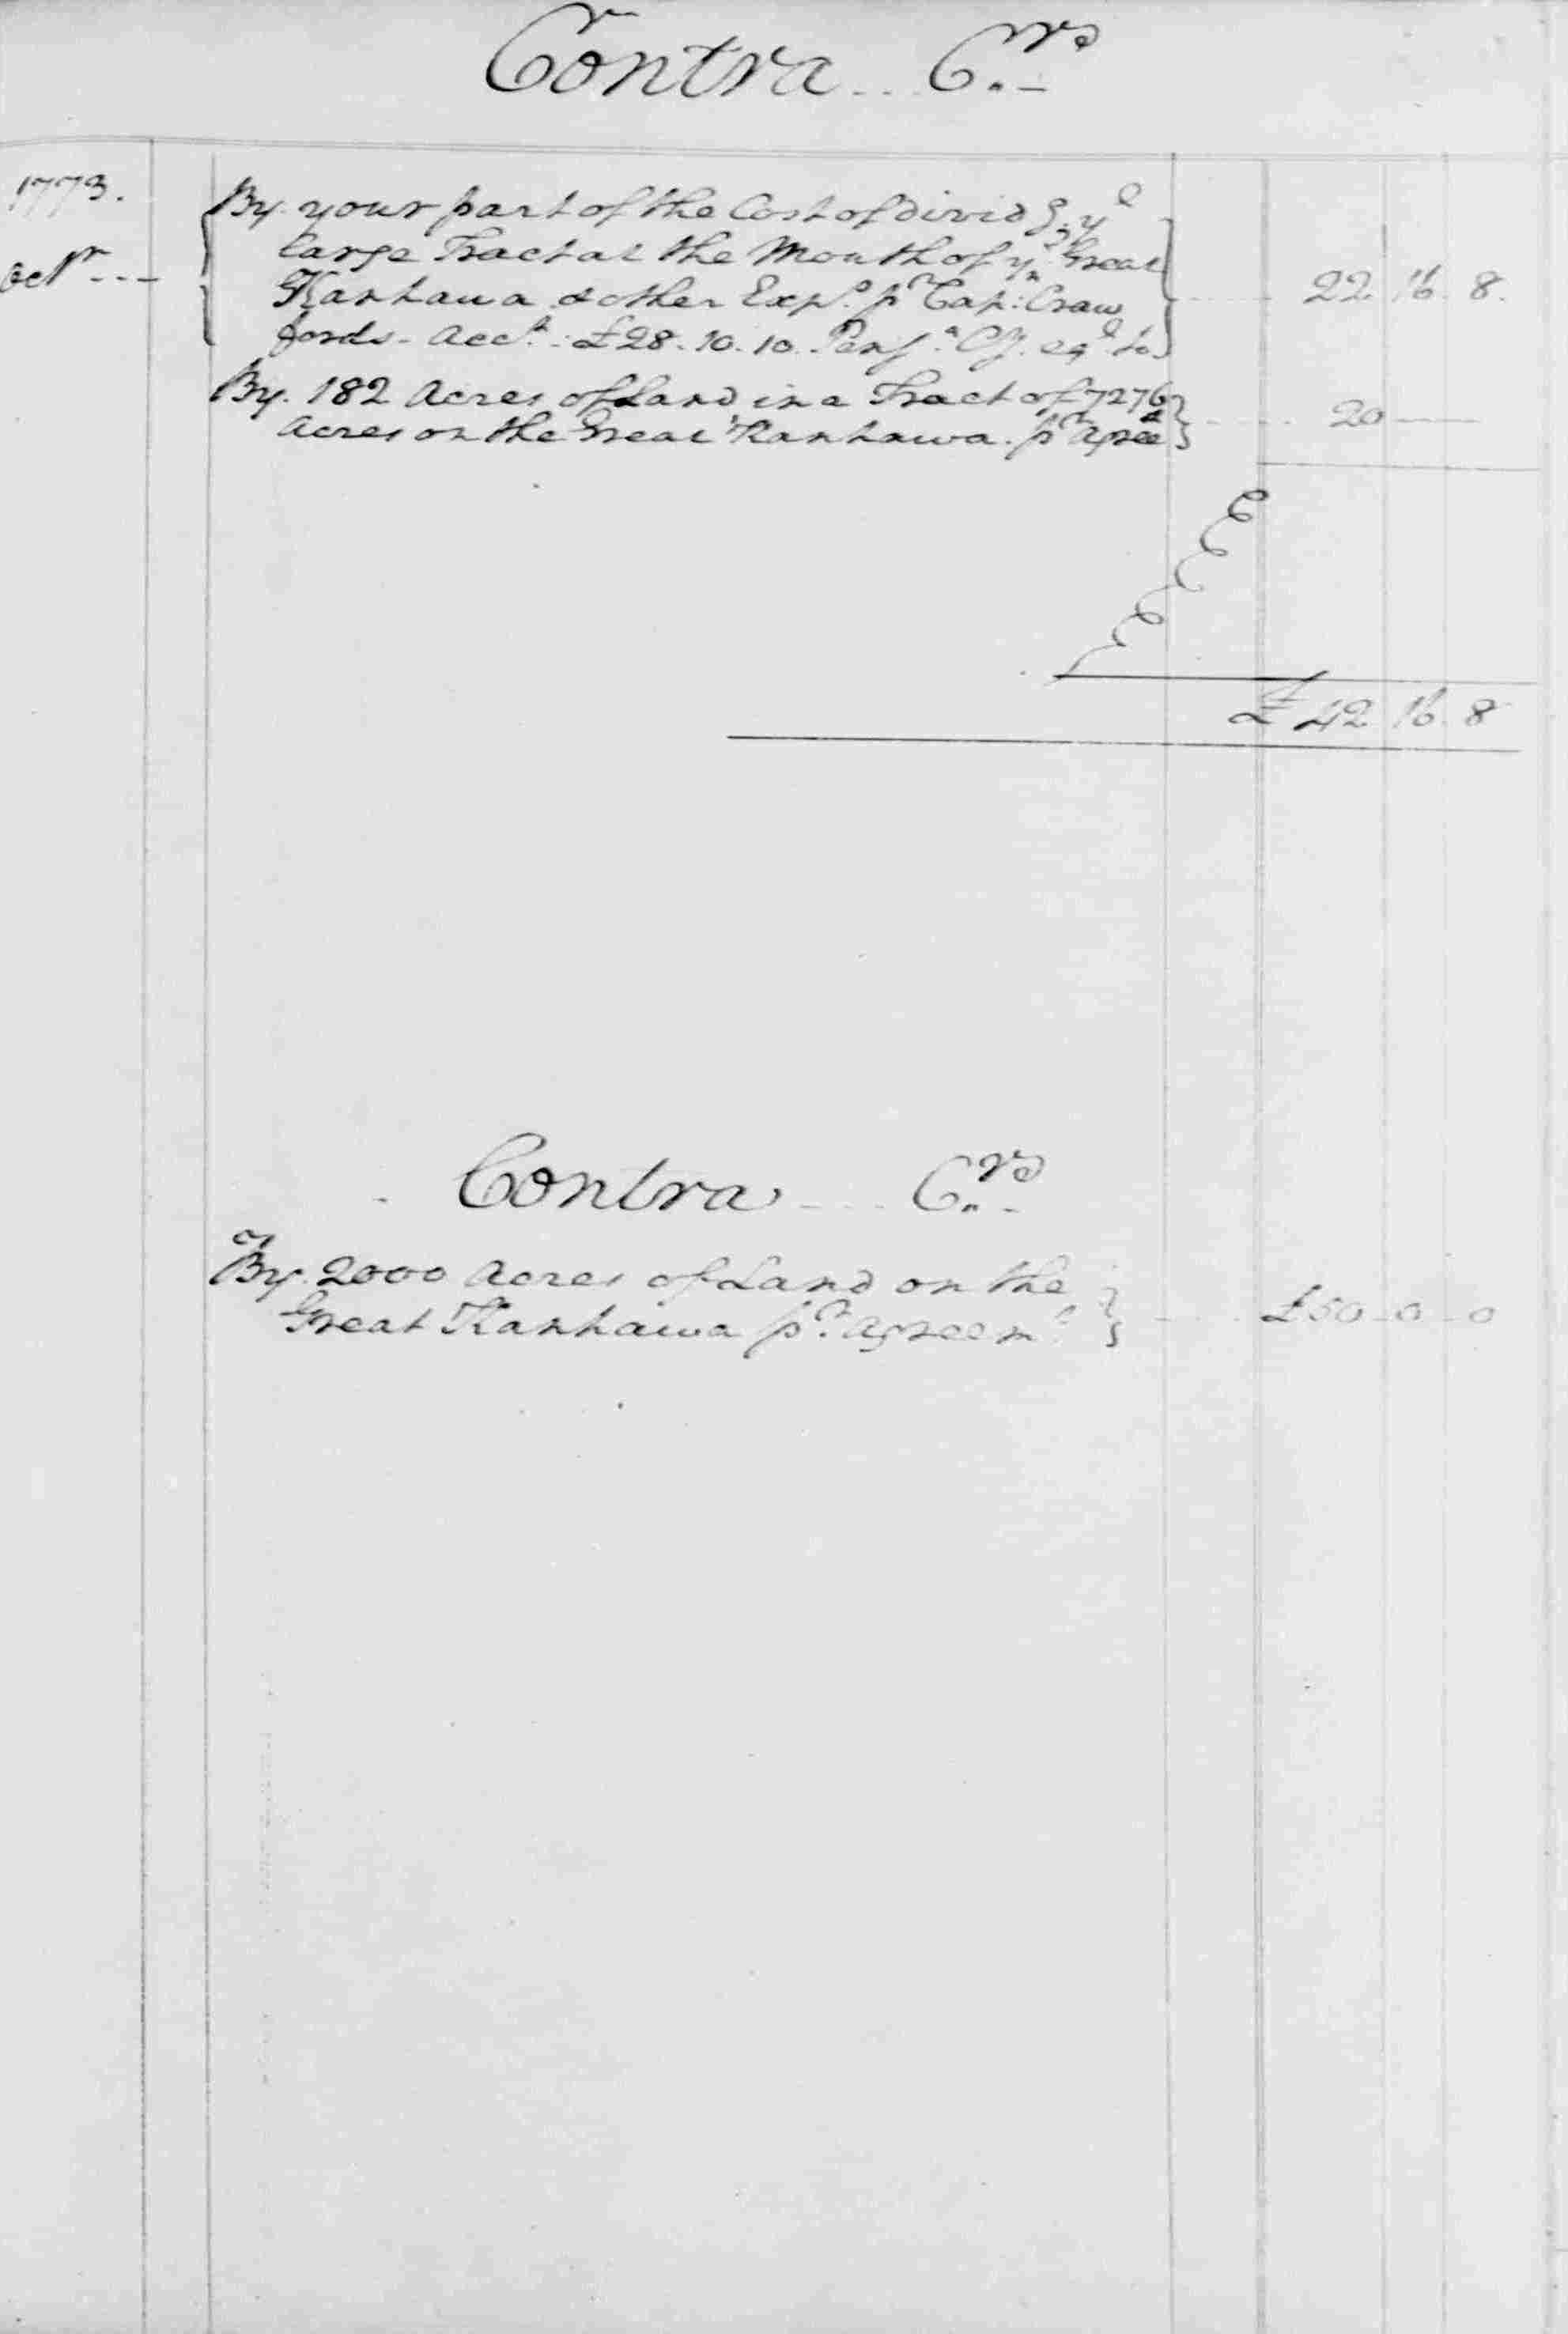 Ledger B, folio 114, right side